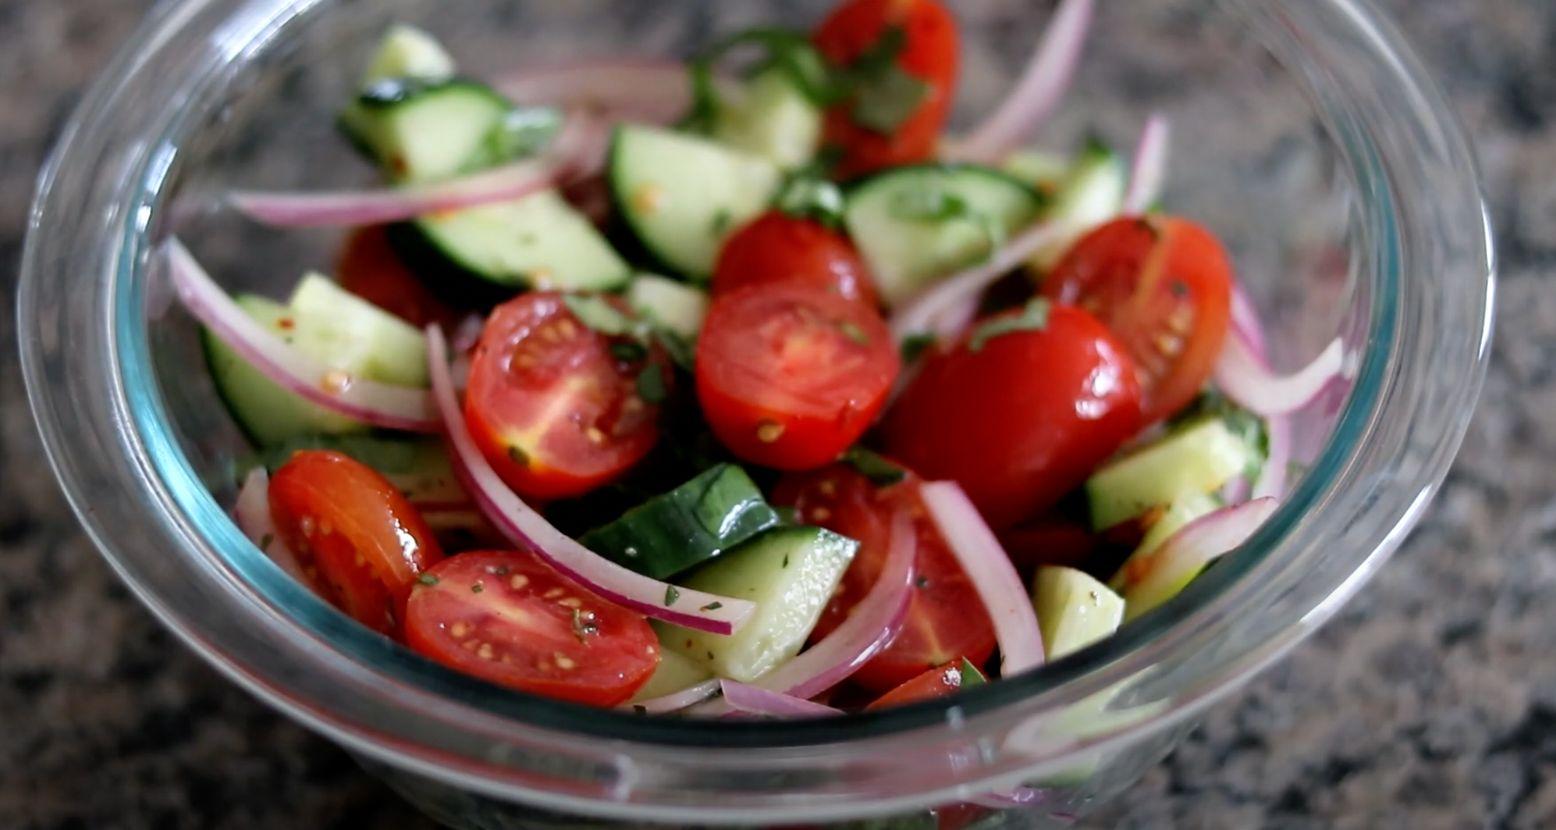 Tomato, Cucumber, and Sweet Onion Salad with Cumin Salt Recipe